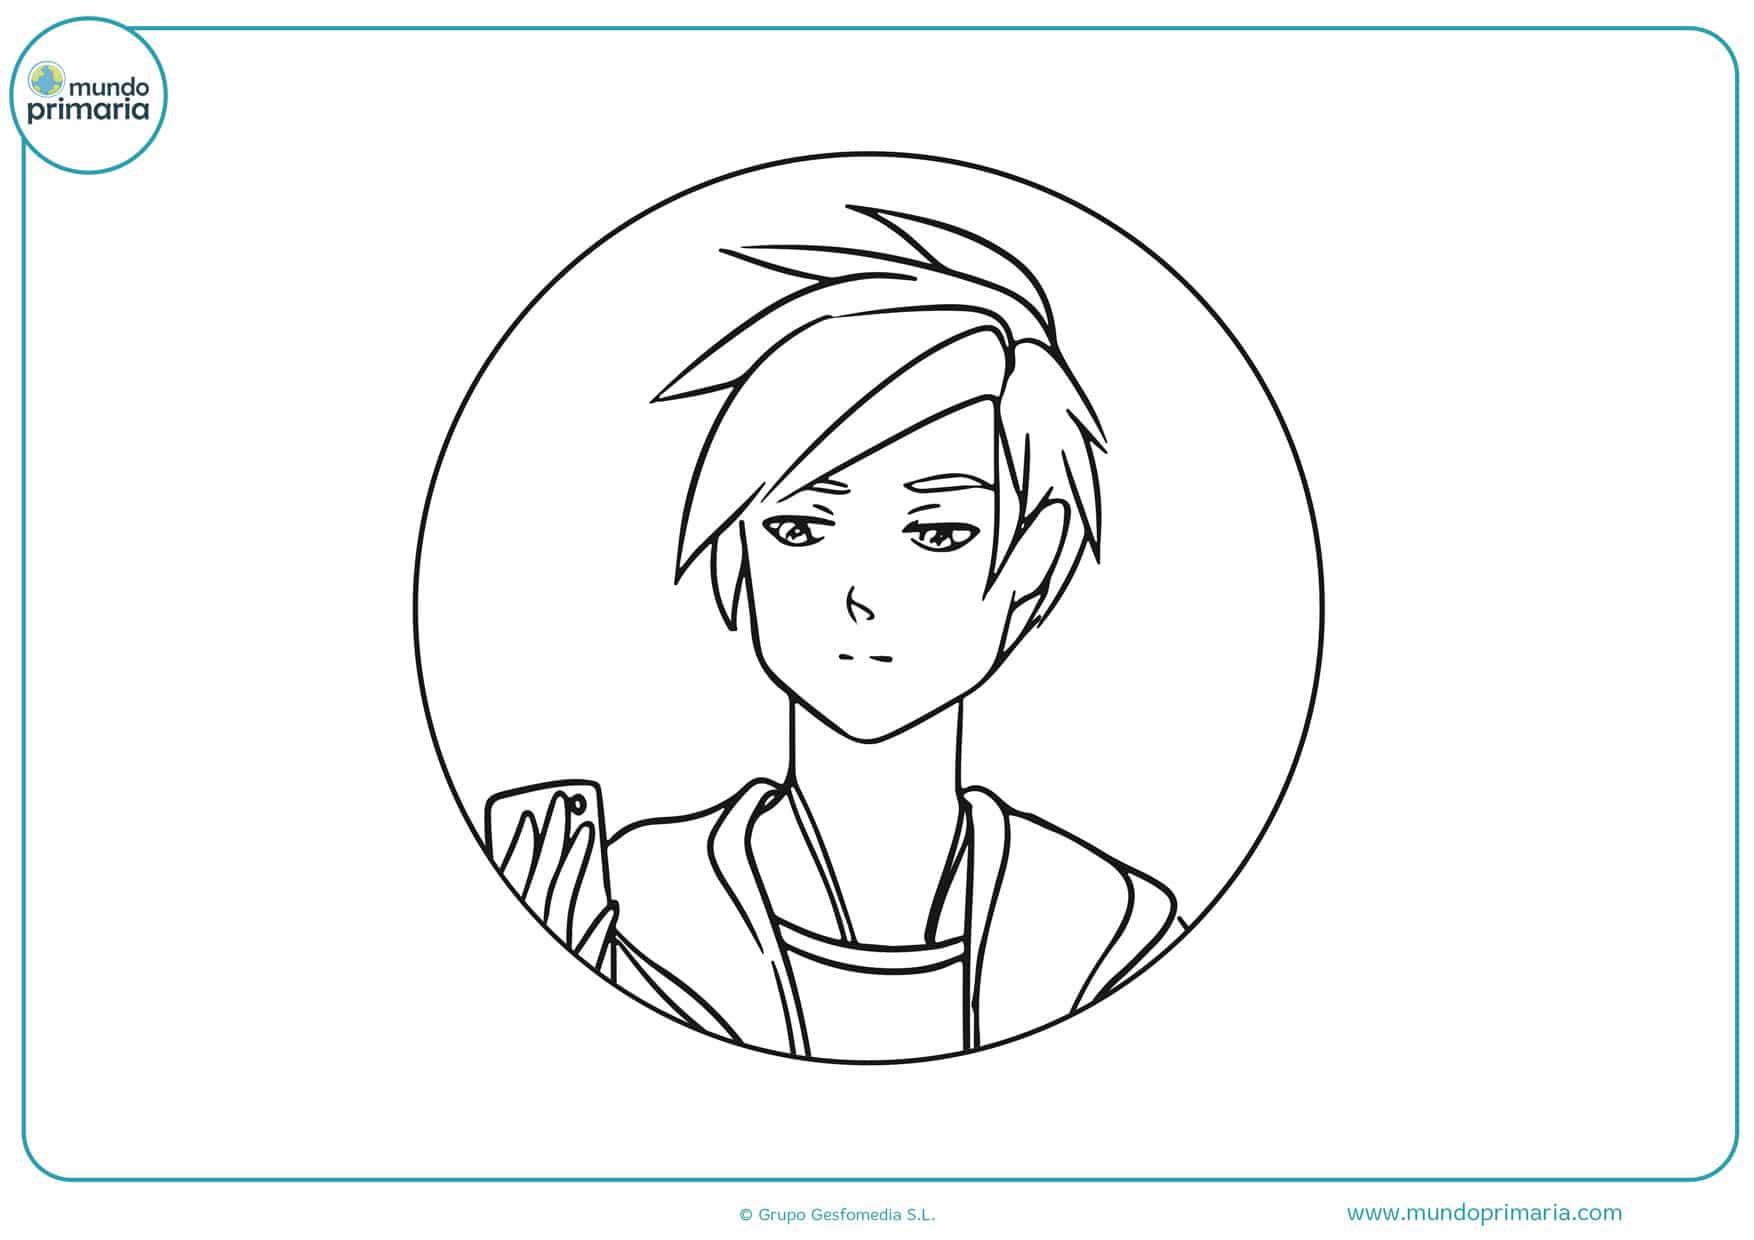 imágenes de anime manga para colorear